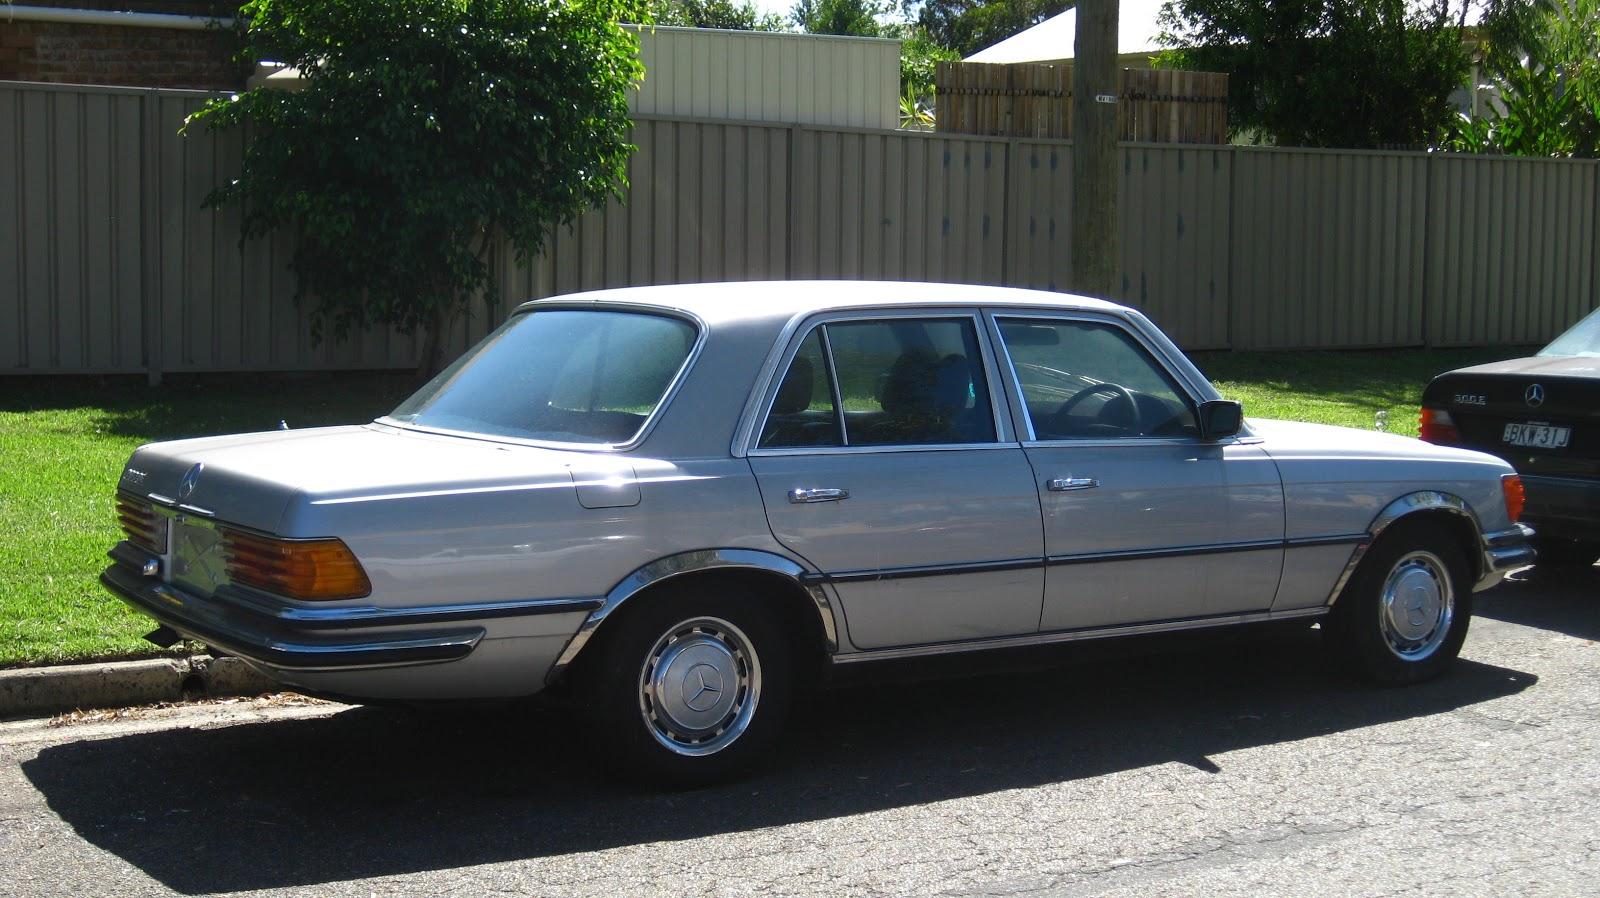 aussie old parked cars 1974 mercedes benz w116 280 se. Black Bedroom Furniture Sets. Home Design Ideas